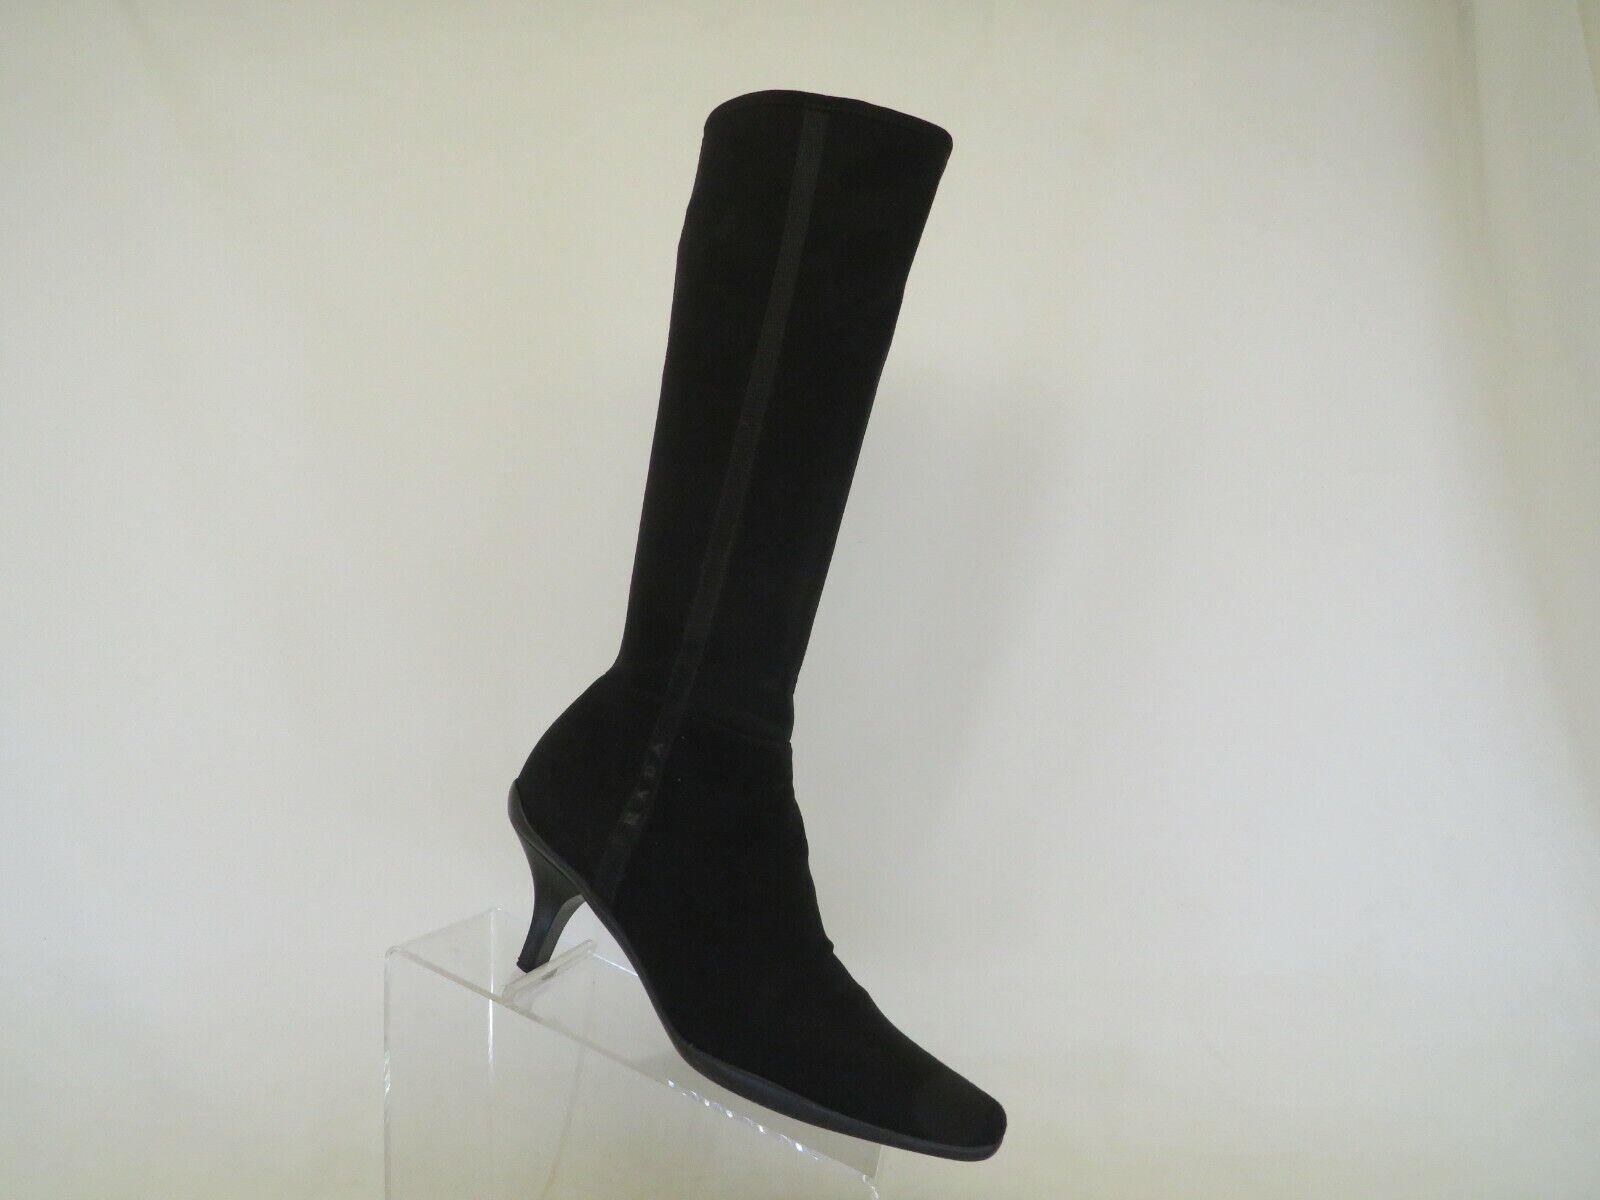 Prada Black Gore Tex Zip Kitten Heel Knee High Fashion Boots Size 37.5 EUR Italy